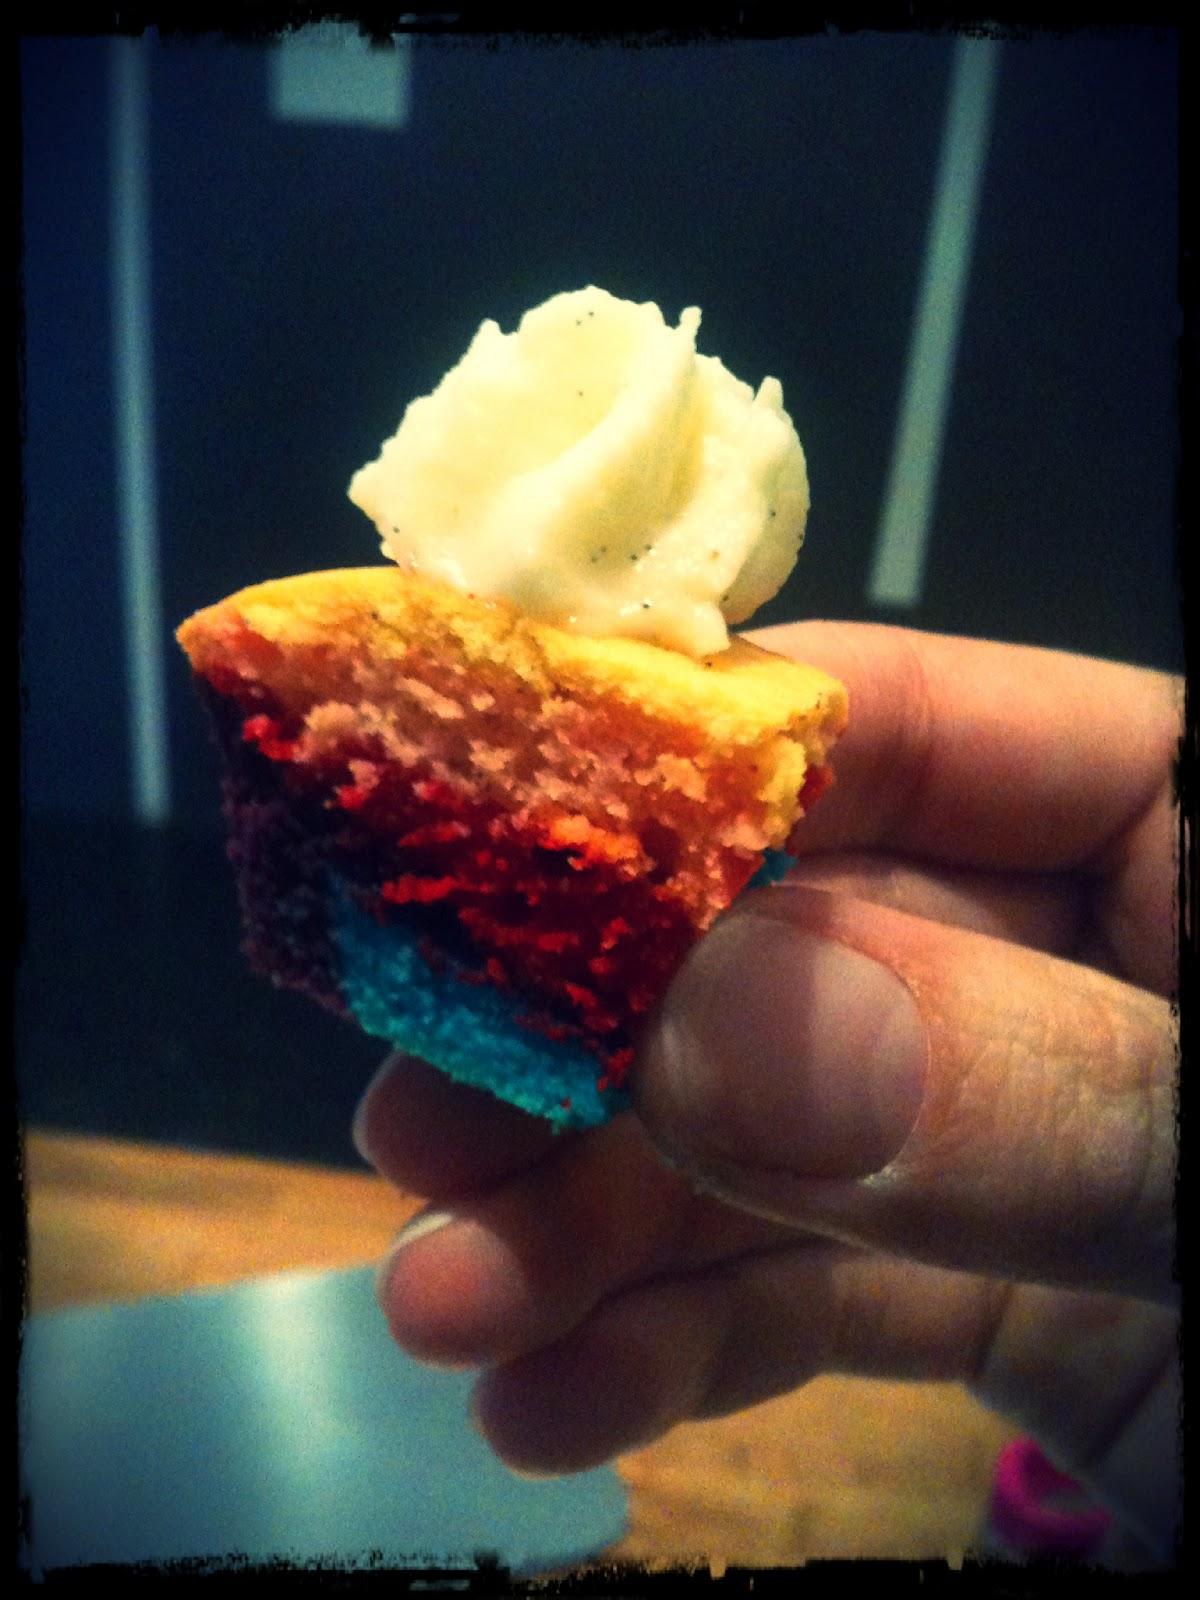 maurine u0026 39 s blog  cupcakes arc